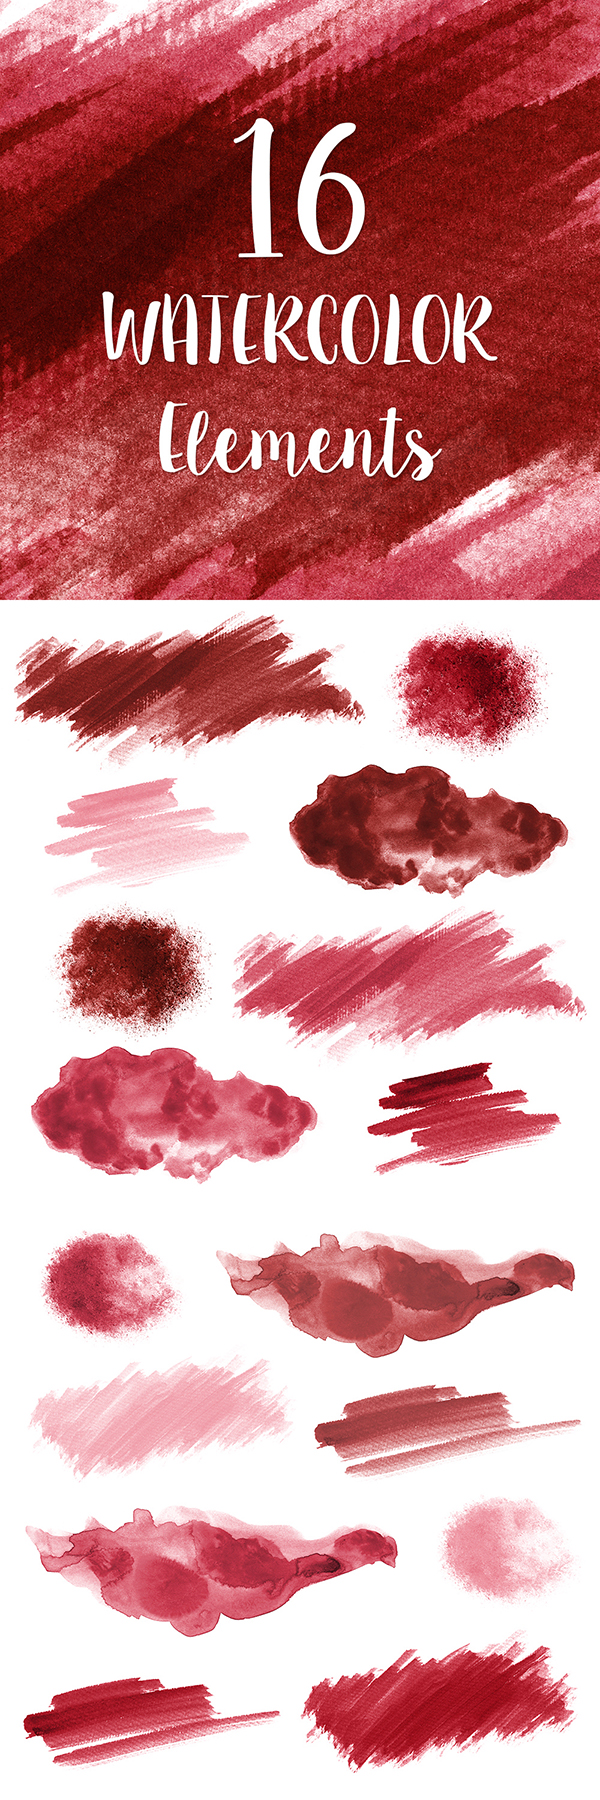 16 Red Watercolor Splotches Splatters Brush Strokes Red Etsy Watercolor Design Watercolor Splash Green Watercolor